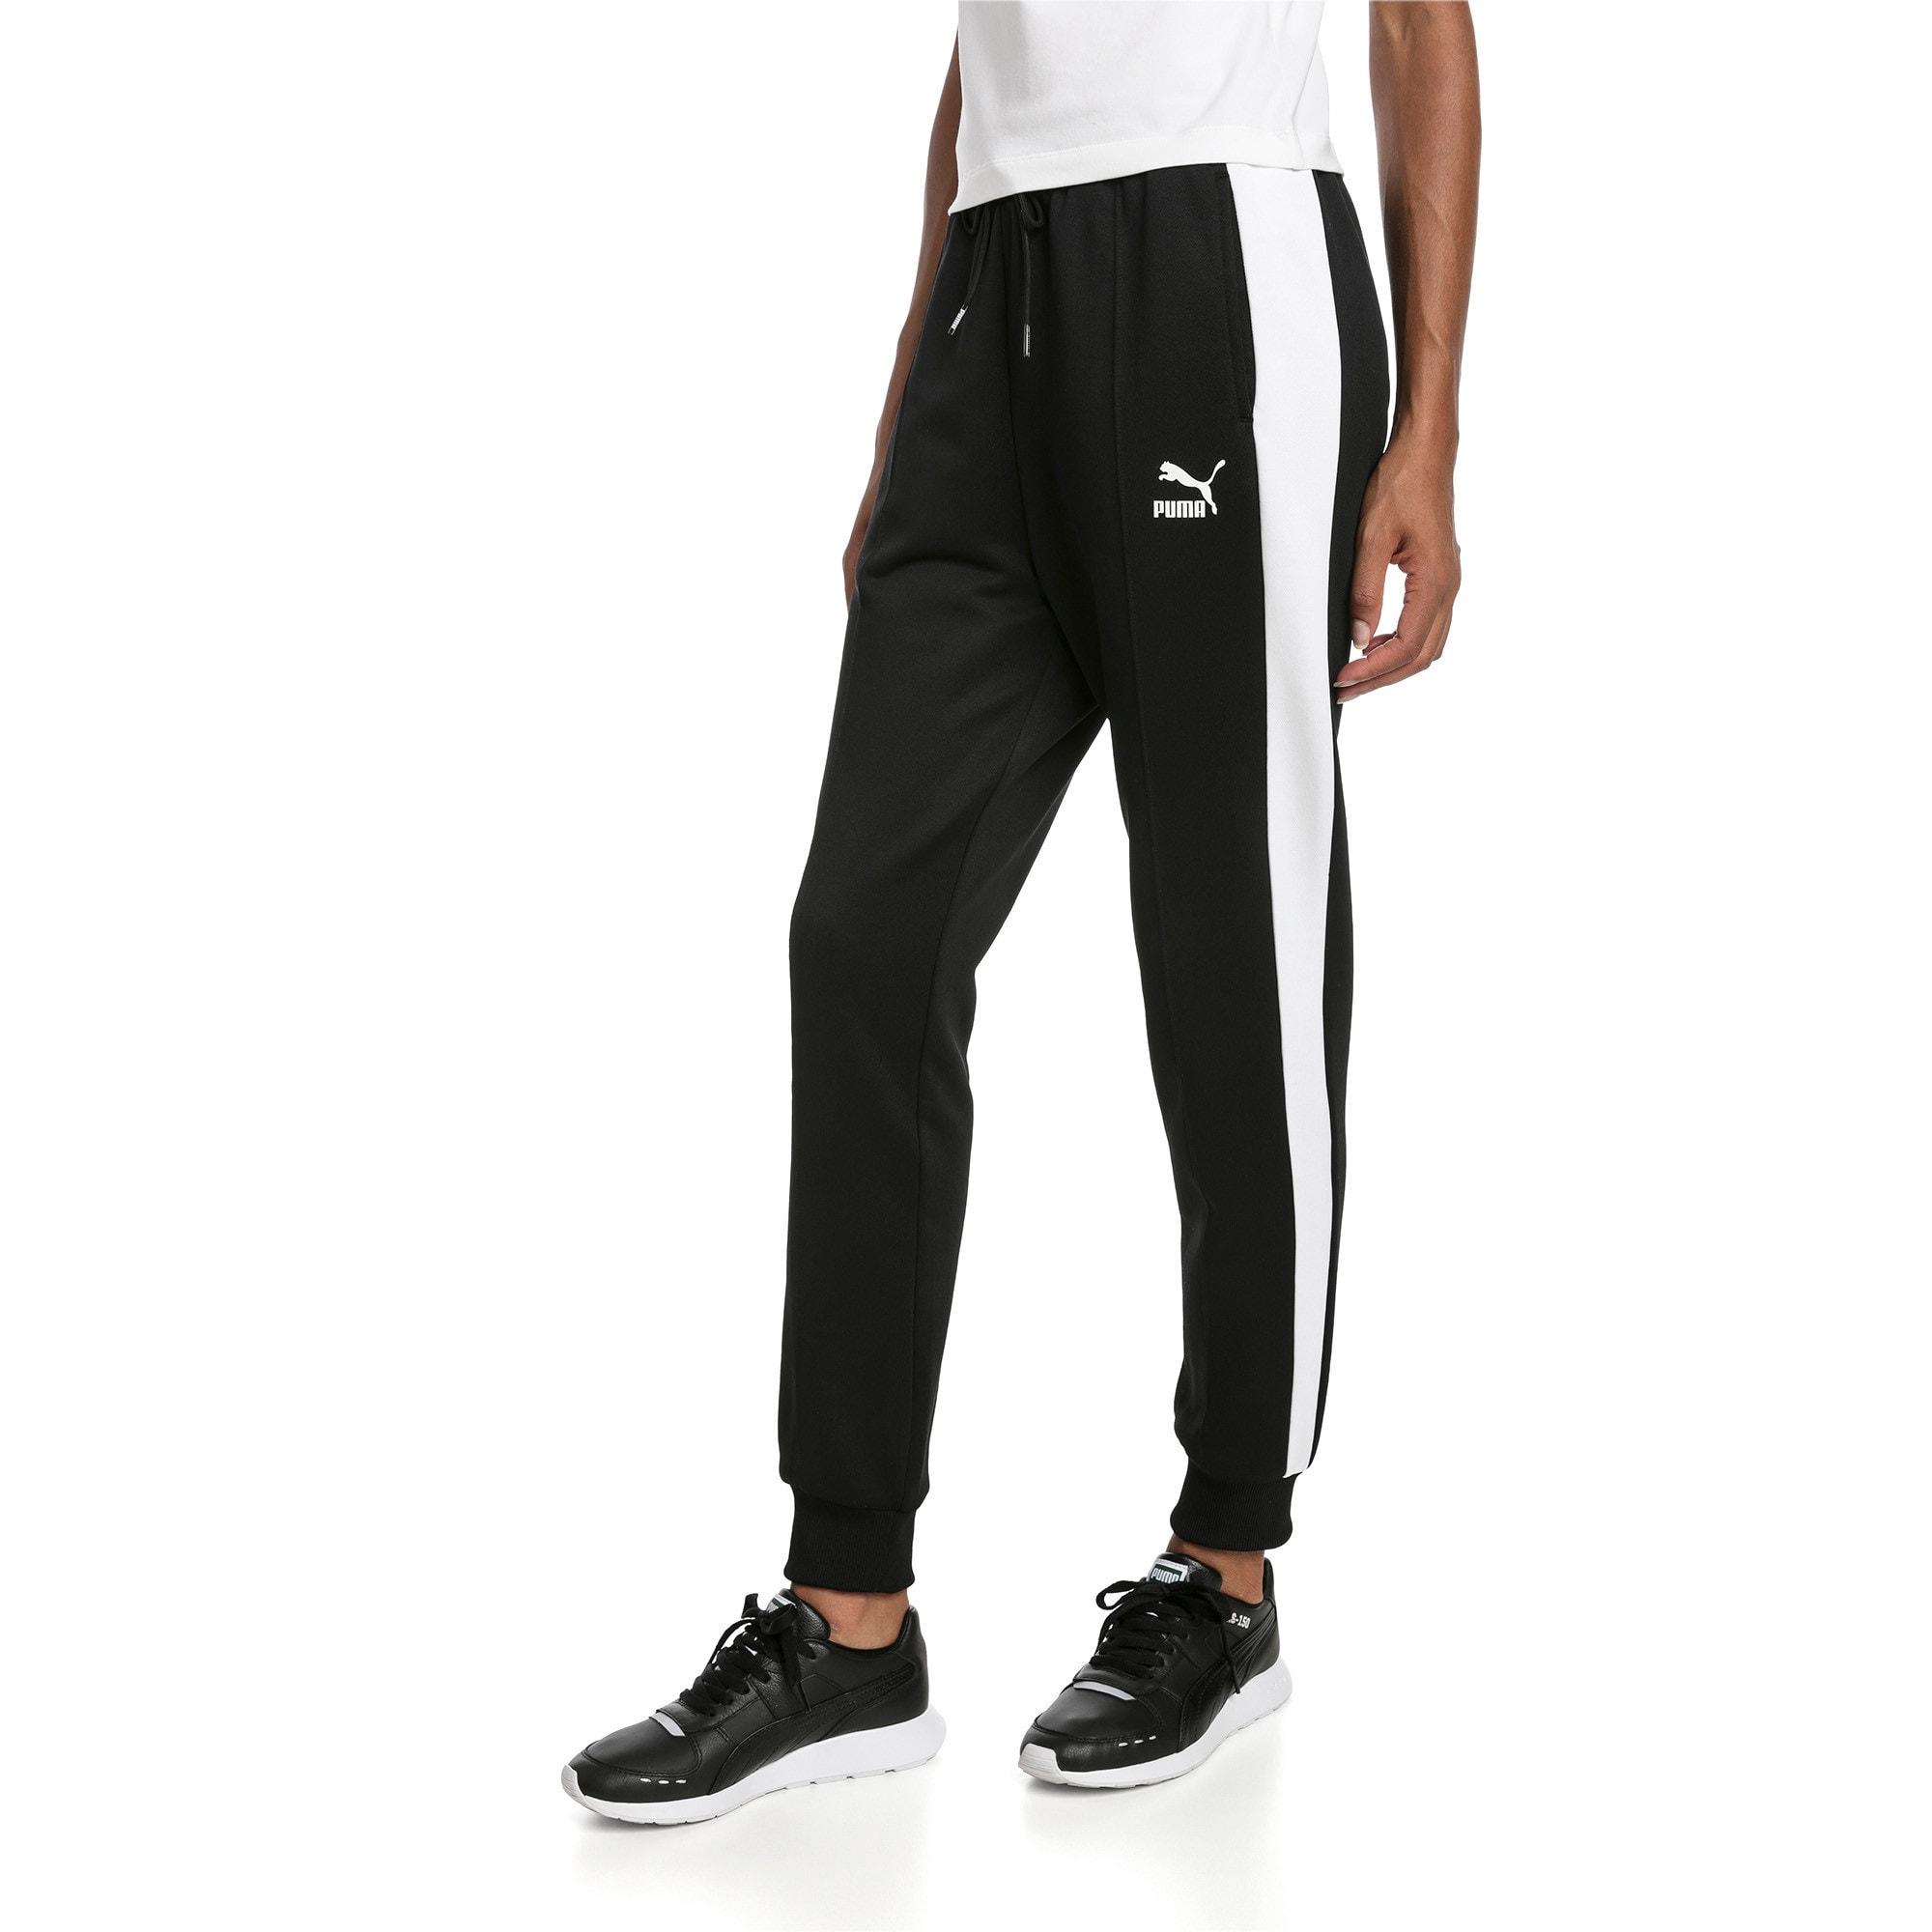 Thumbnail 1 of Classics T7 Knitted Women's Track Pants, Puma Black, medium